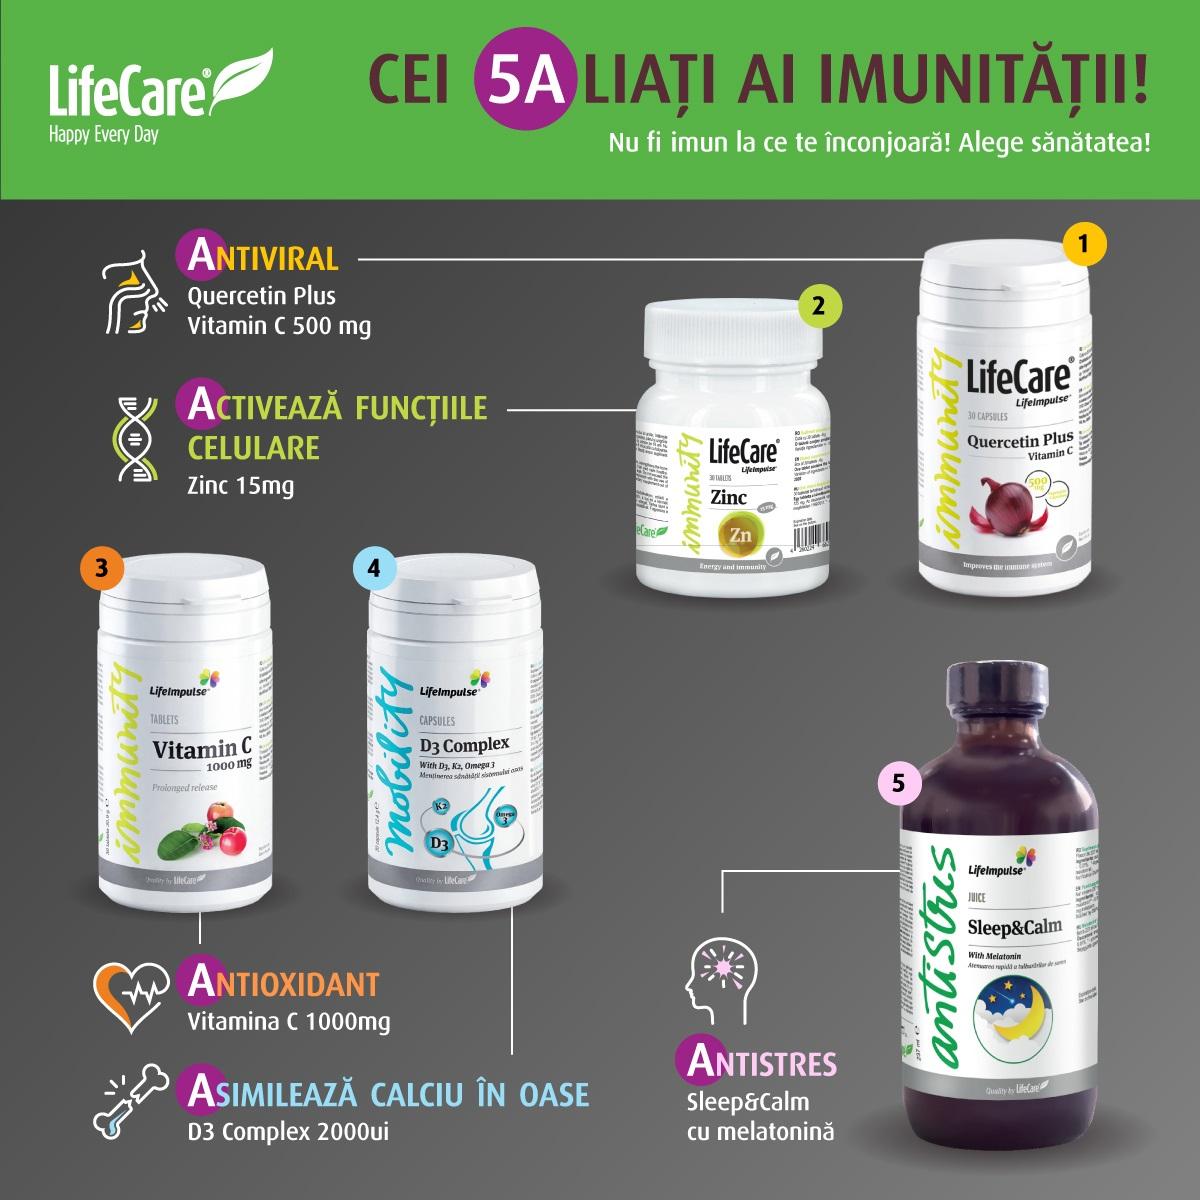 Lifecare imunitate